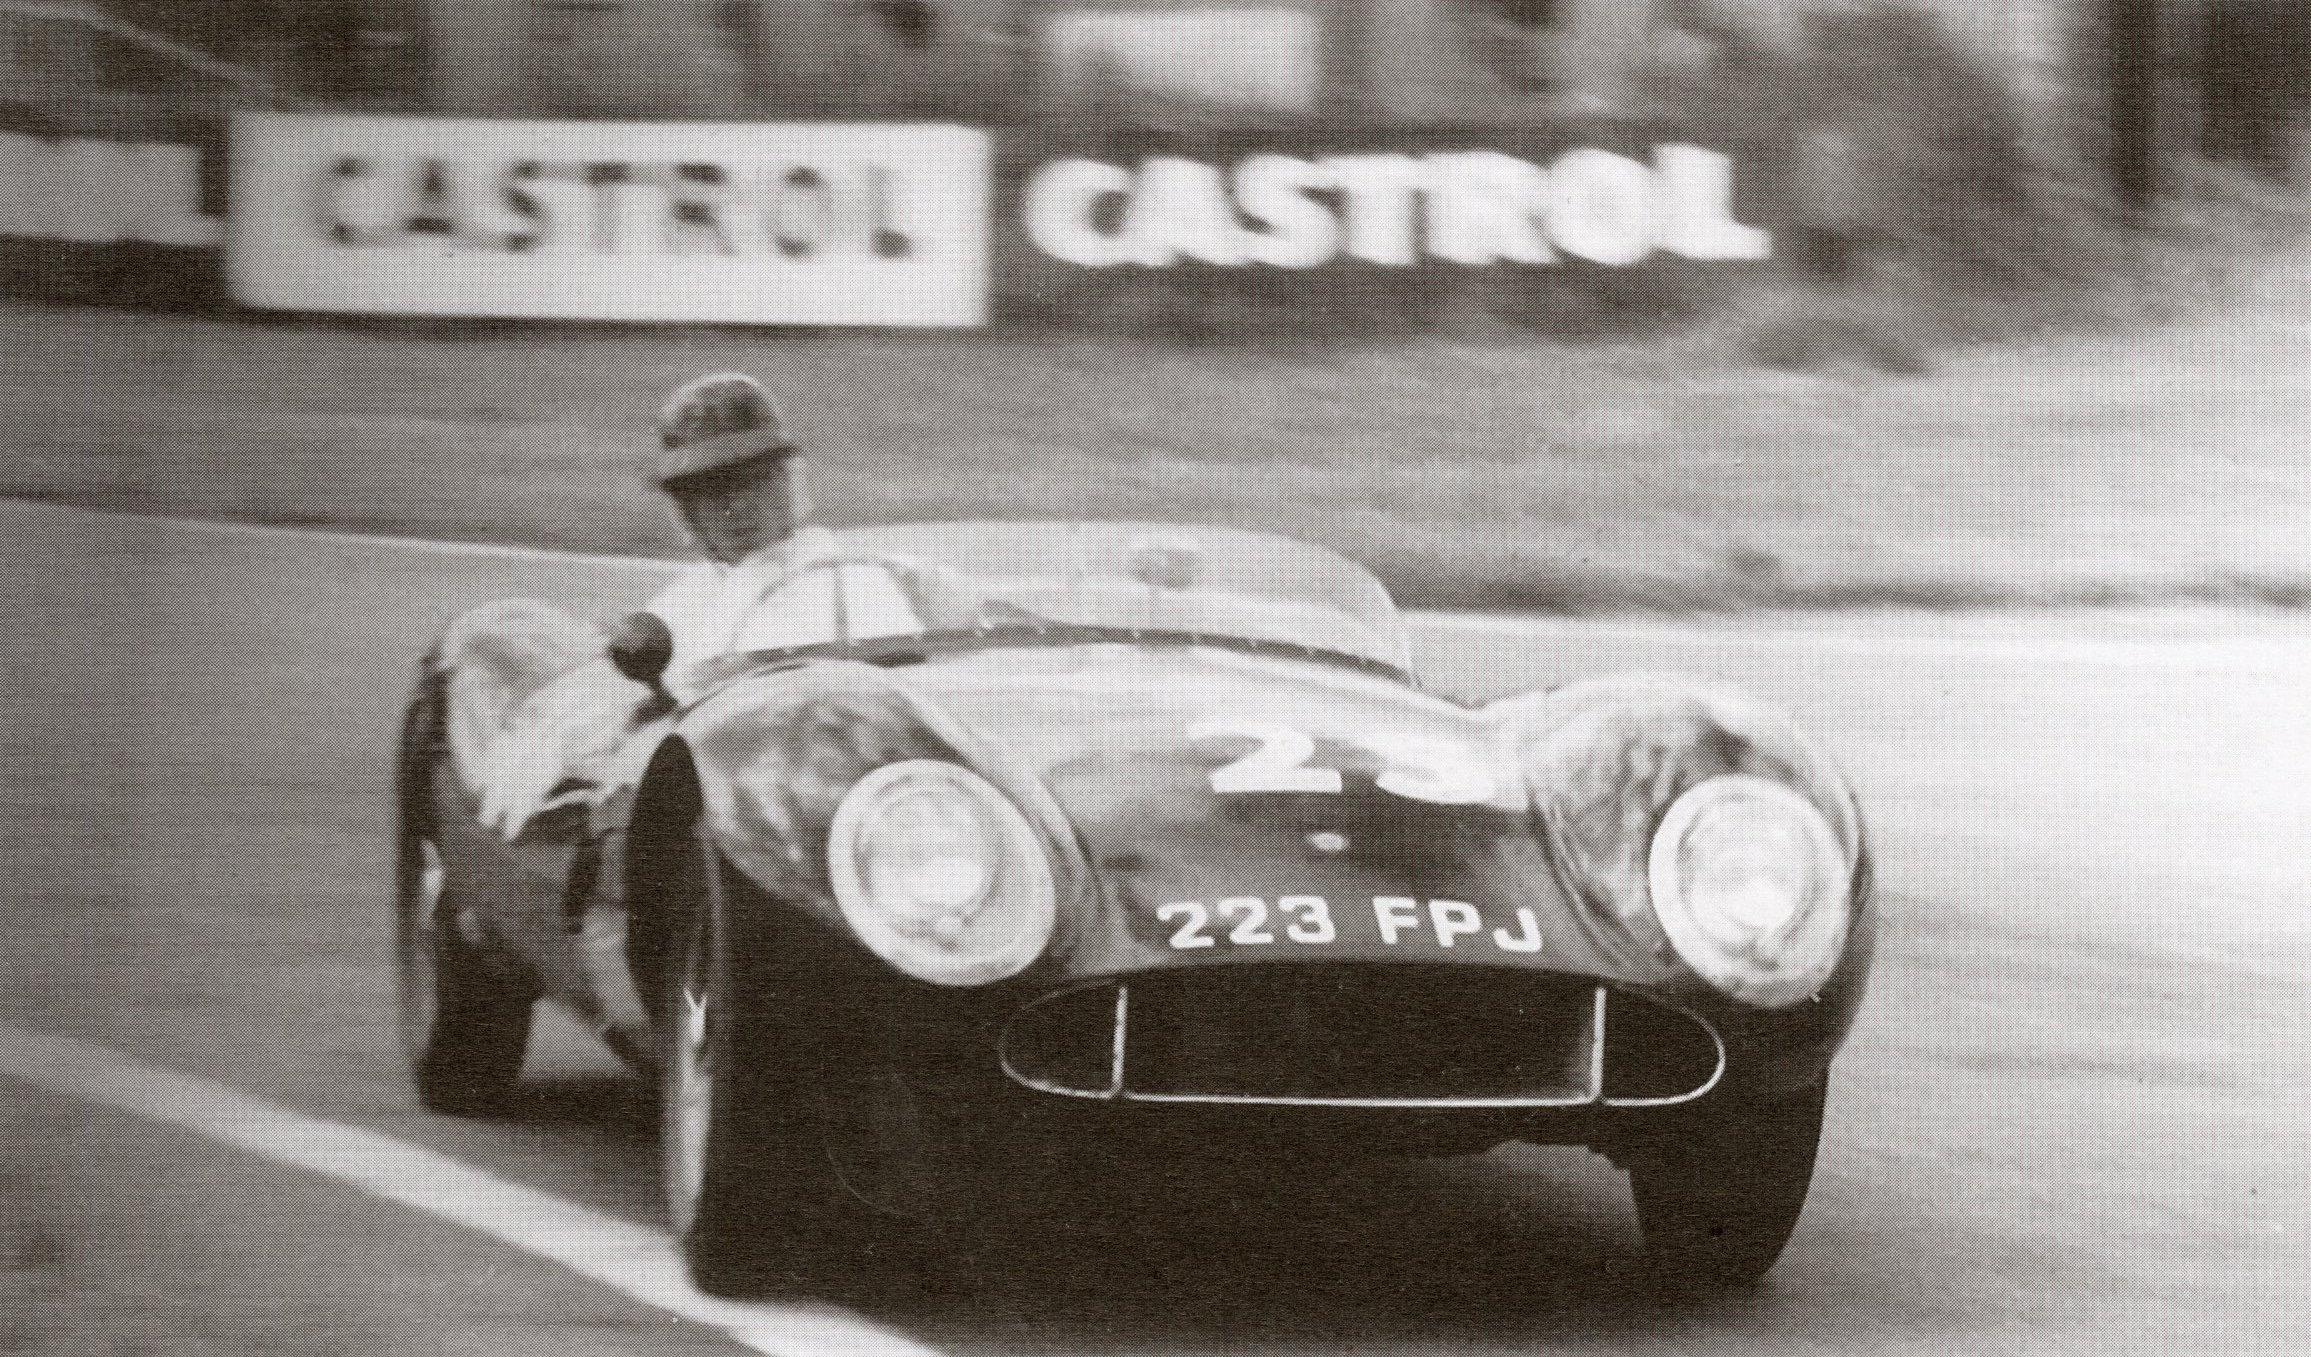 Playford MG, Goodwood, 1958